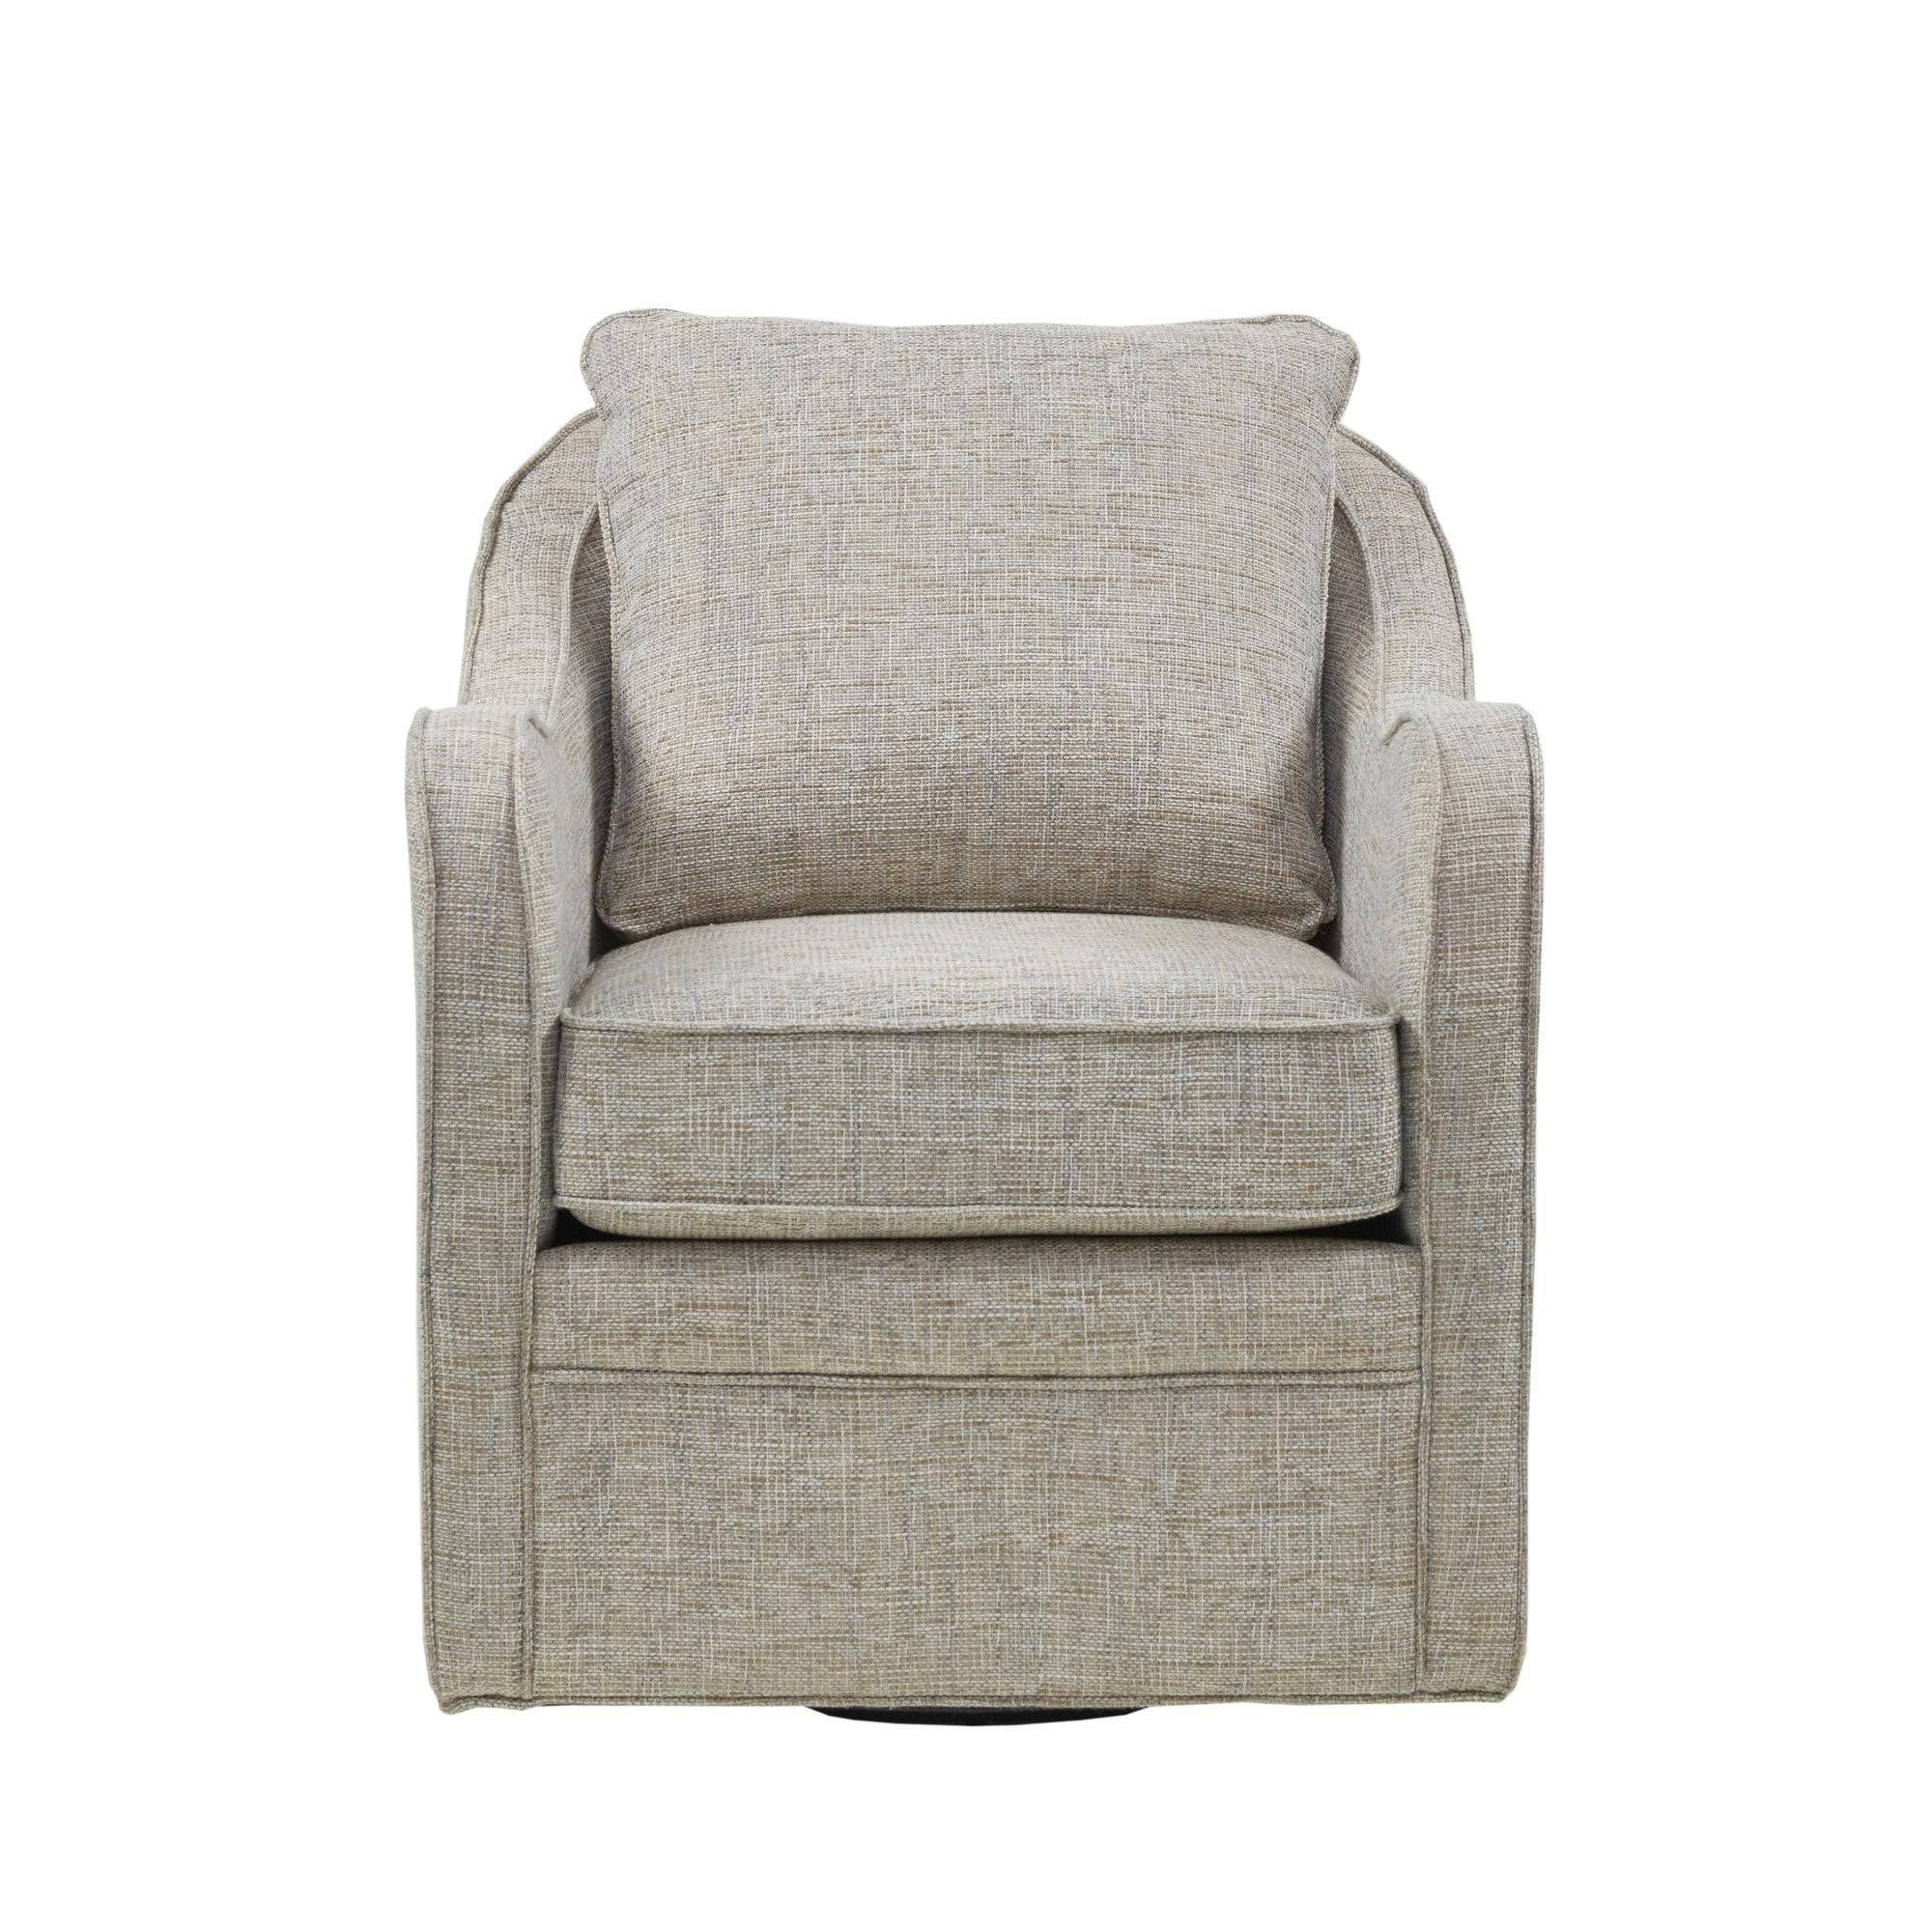 Trendy Loftus Swivel Armchairs With Regard To Madison Park Betty Slub Weave Wide Seat Swivel Arm Chair (View 18 of 20)